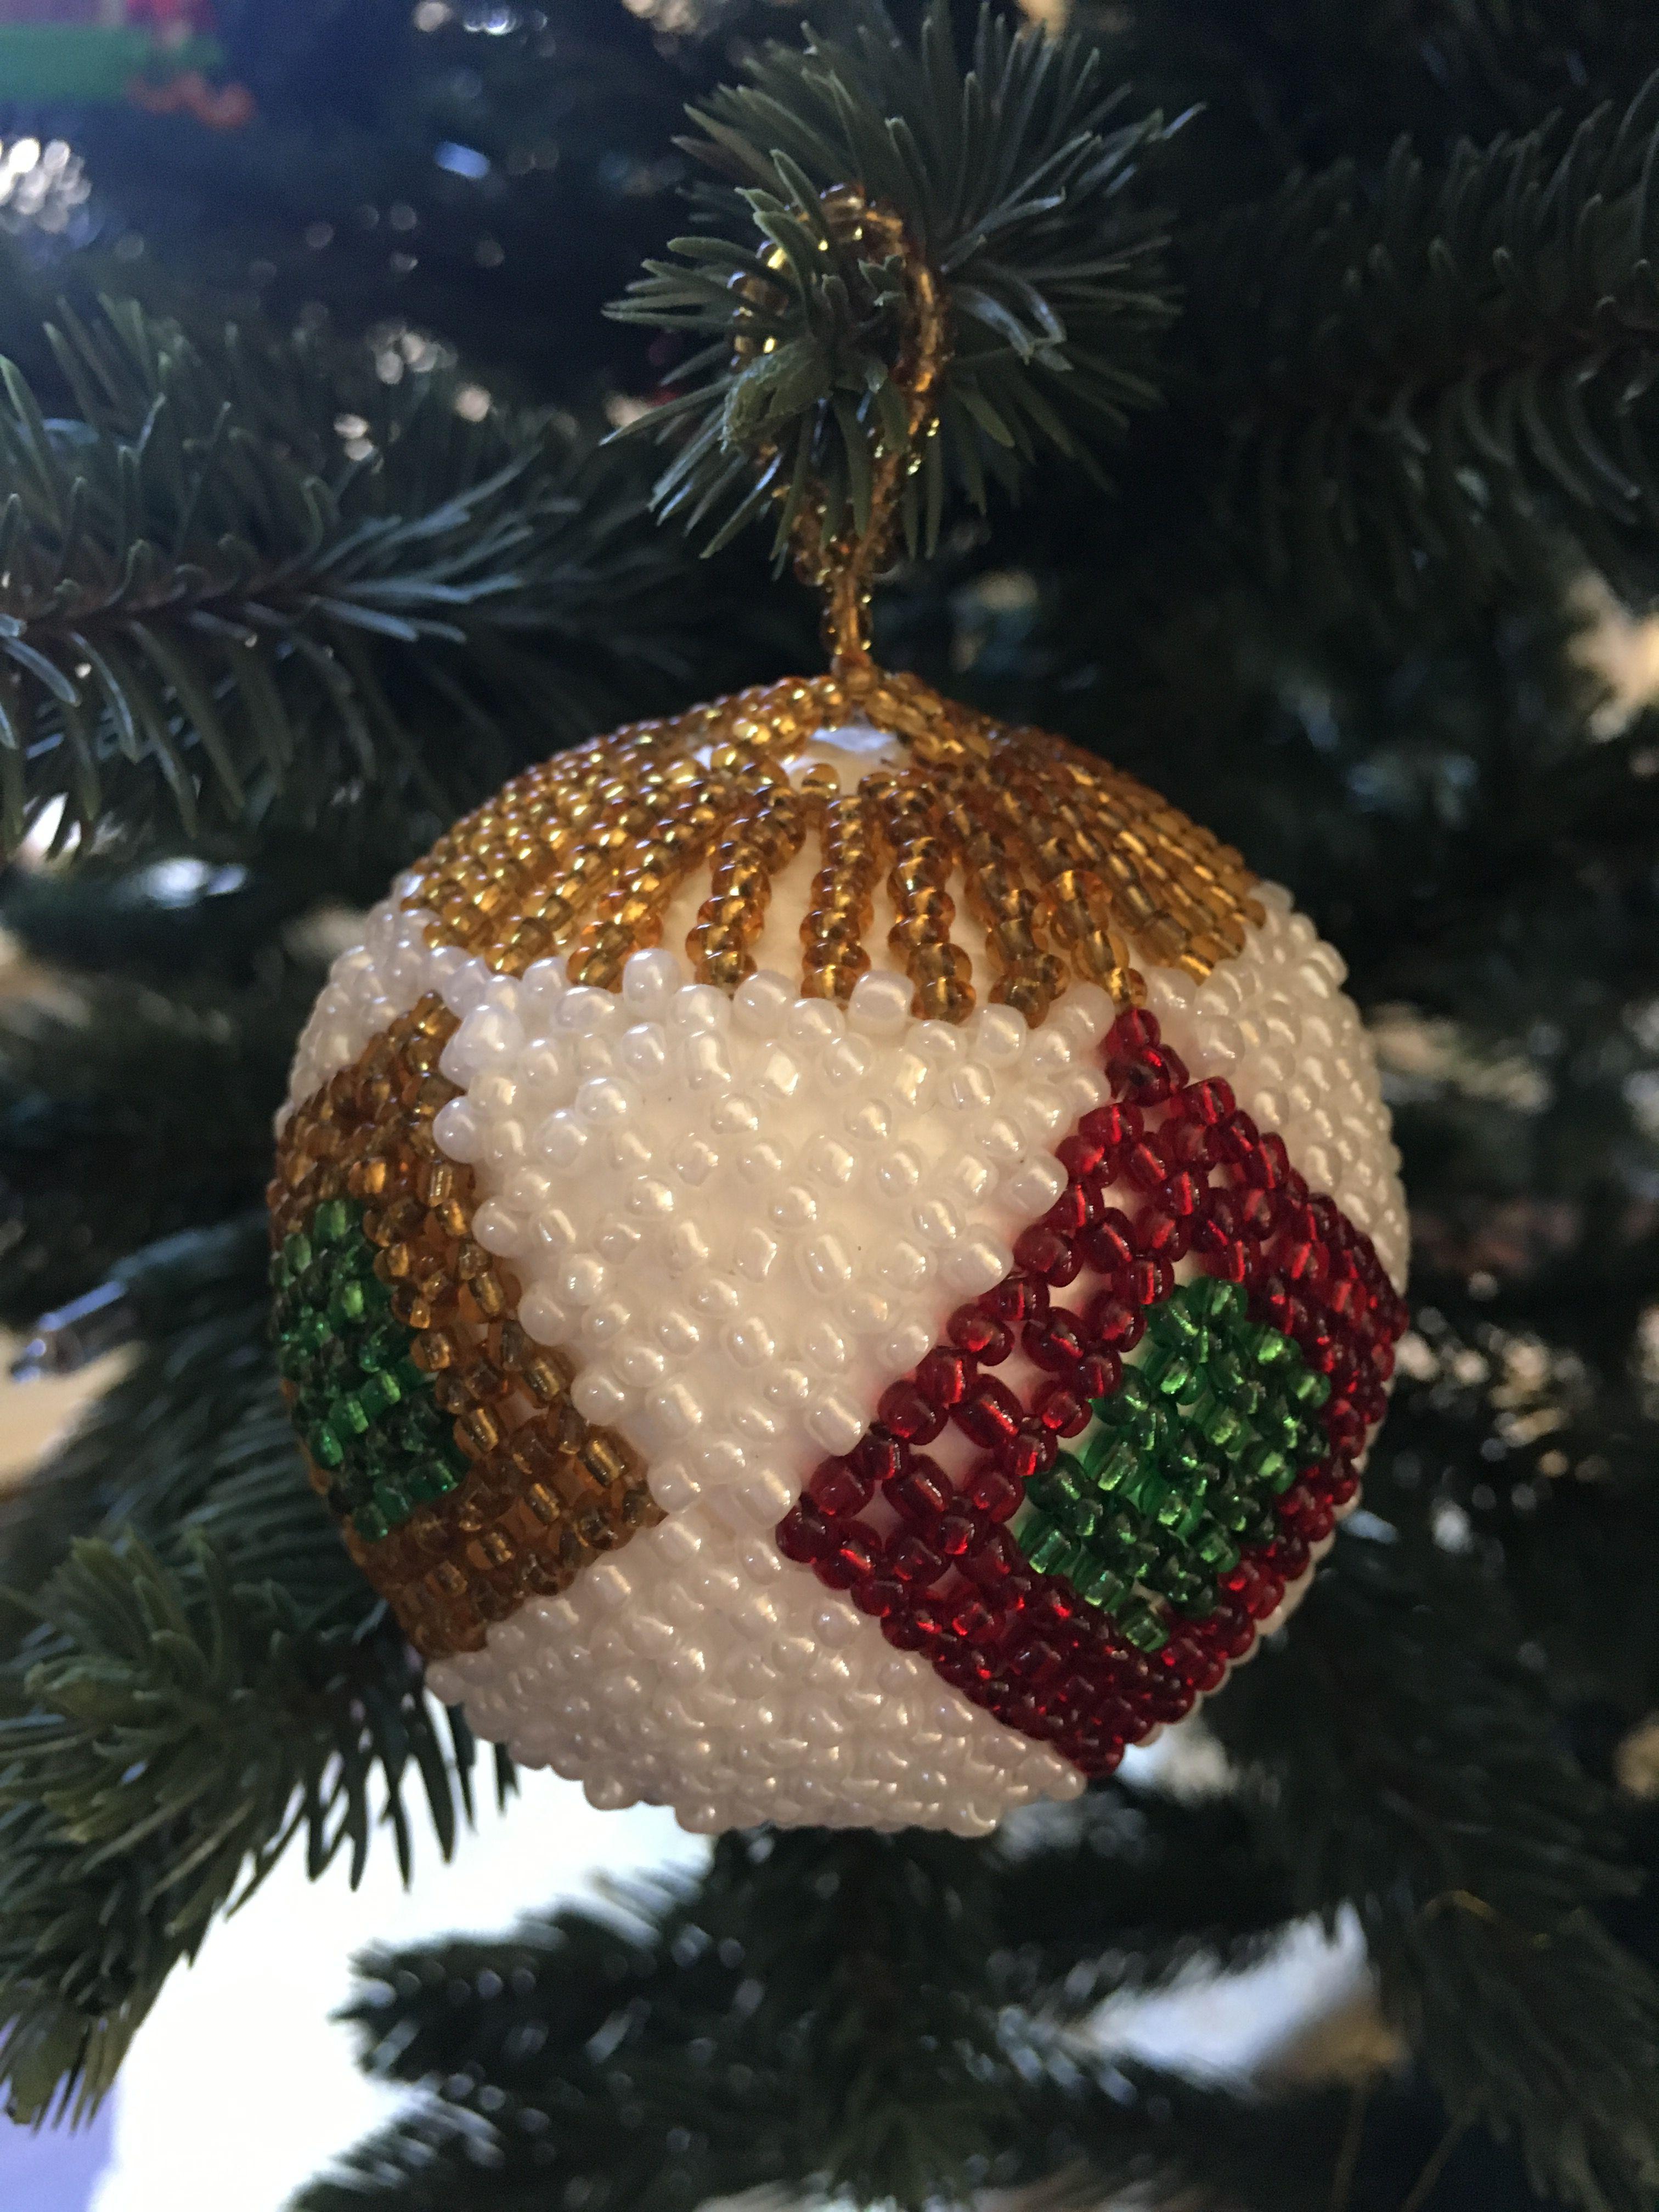 South Africa Christmas Ornaments Christmas Bulbs Holiday Decor